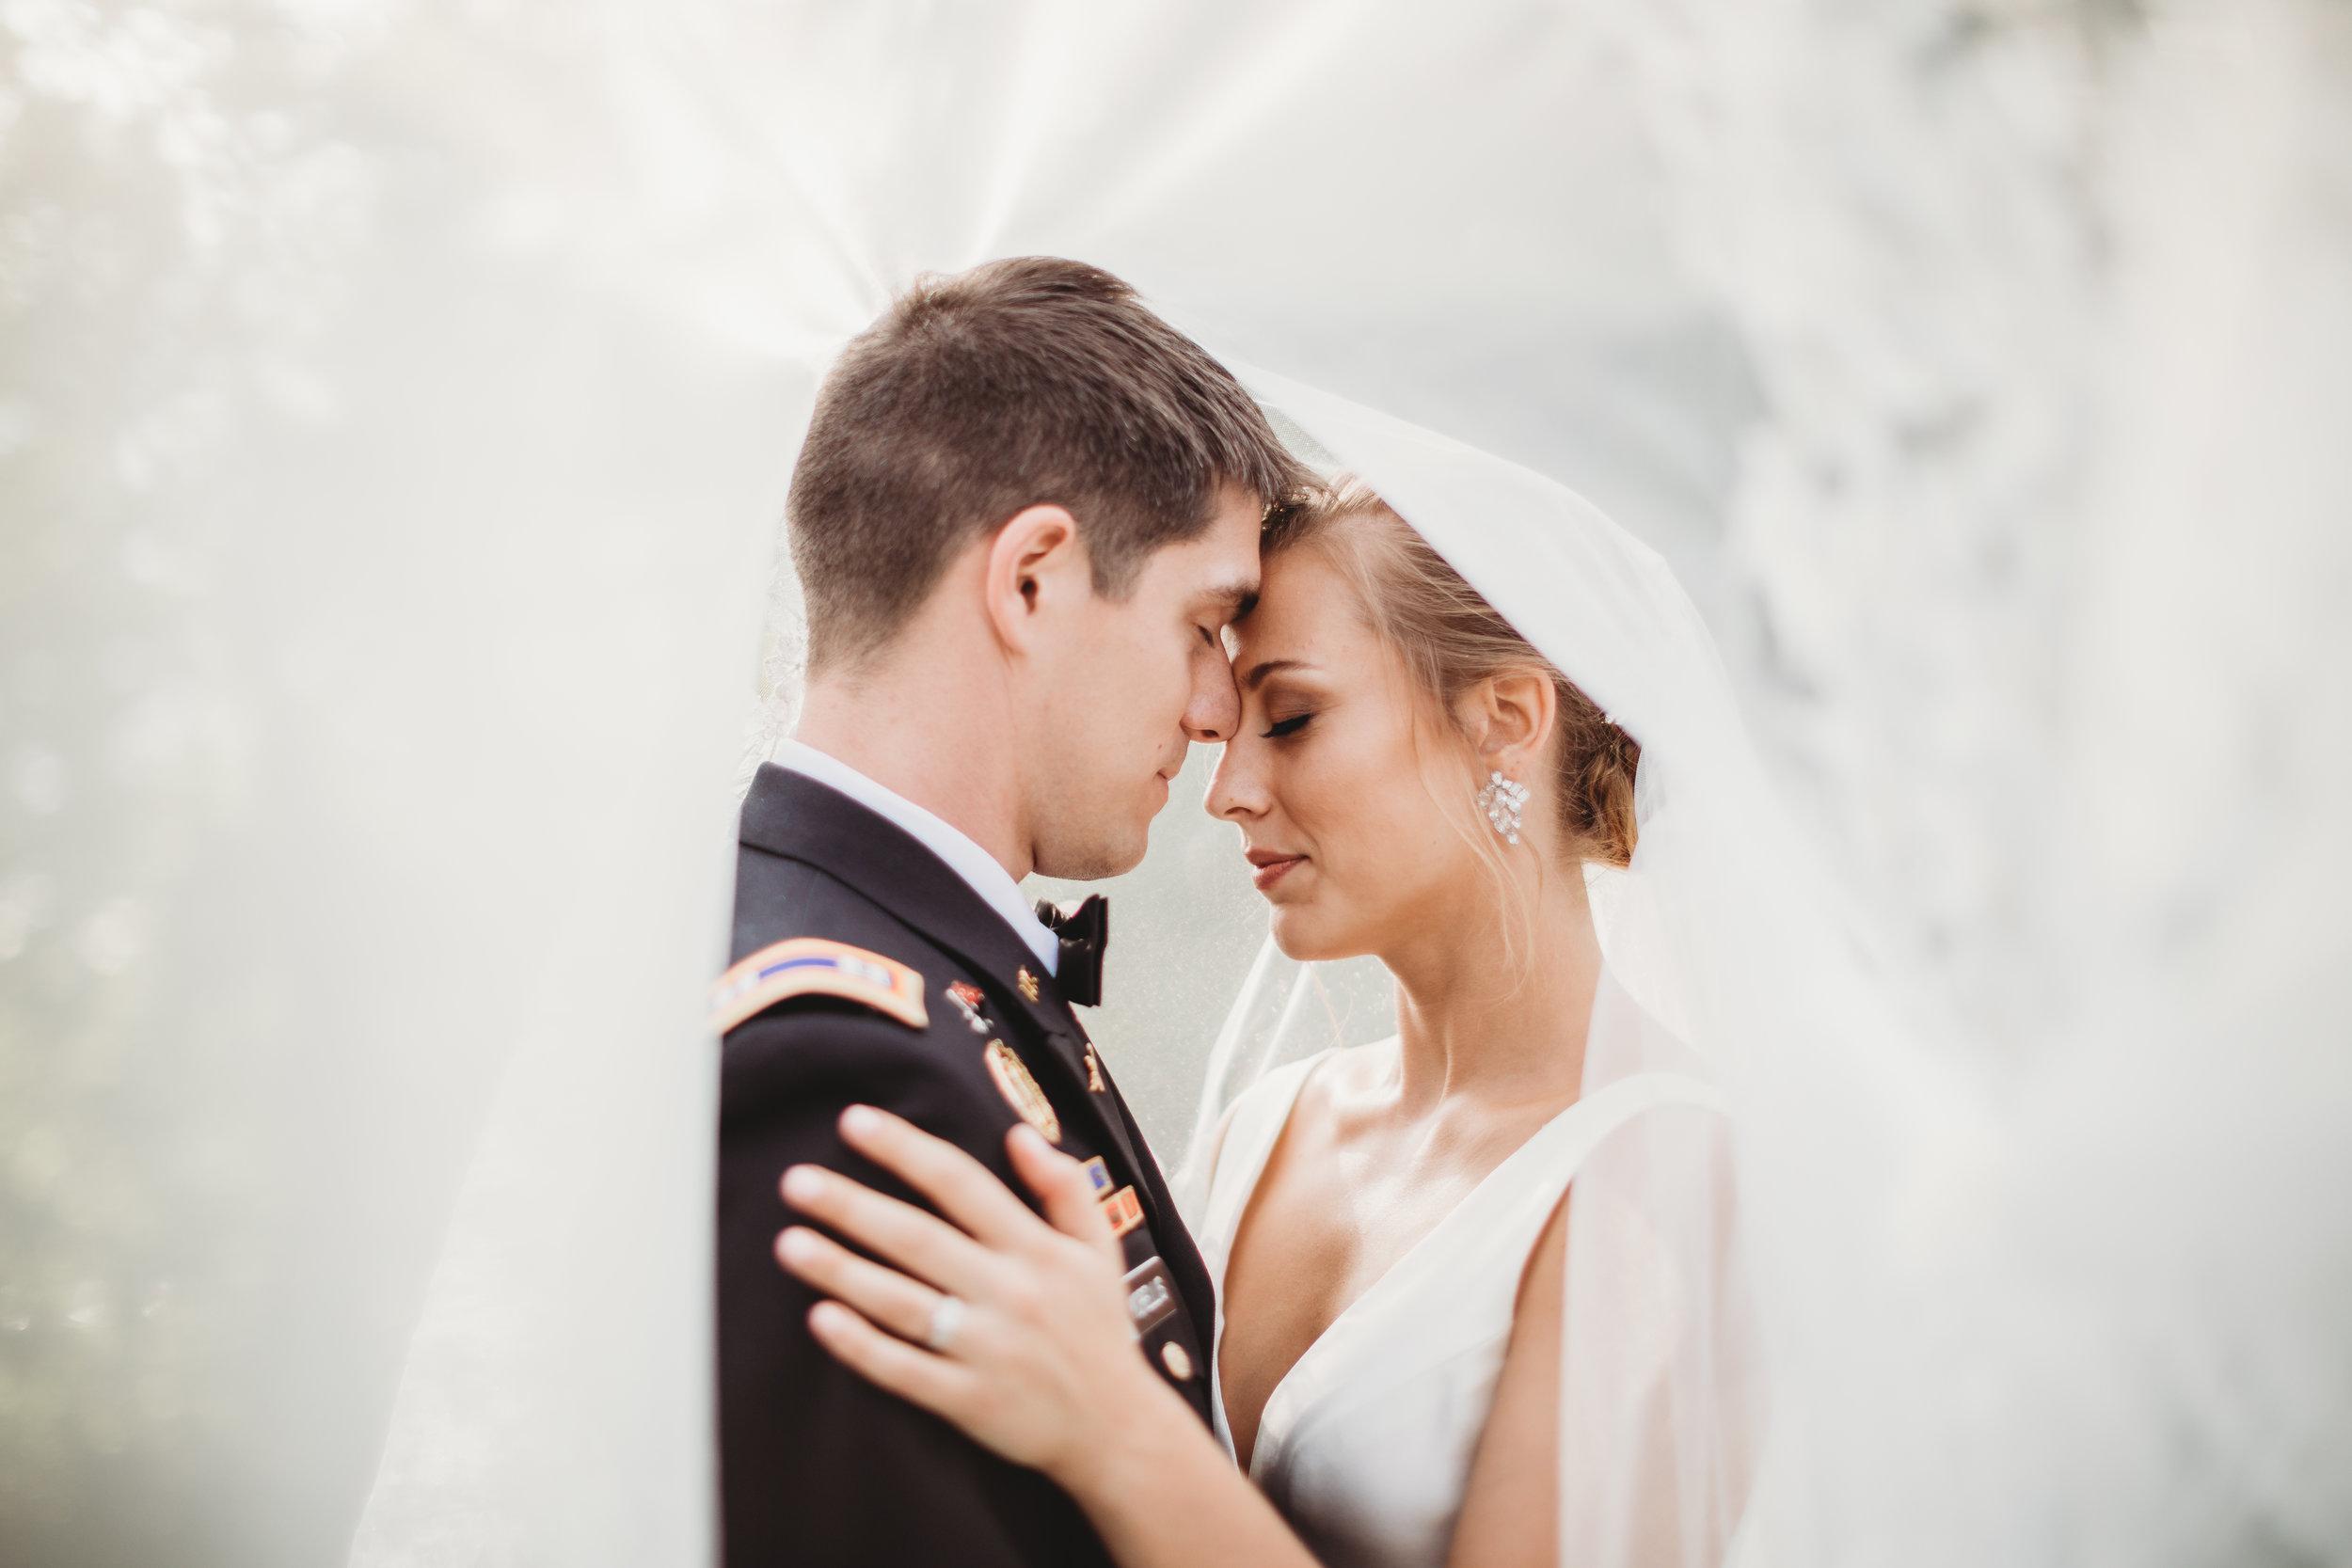 Bride-and-groom-wedding-pose-ideas-lauren-ashley-studios-under-veil.jpg